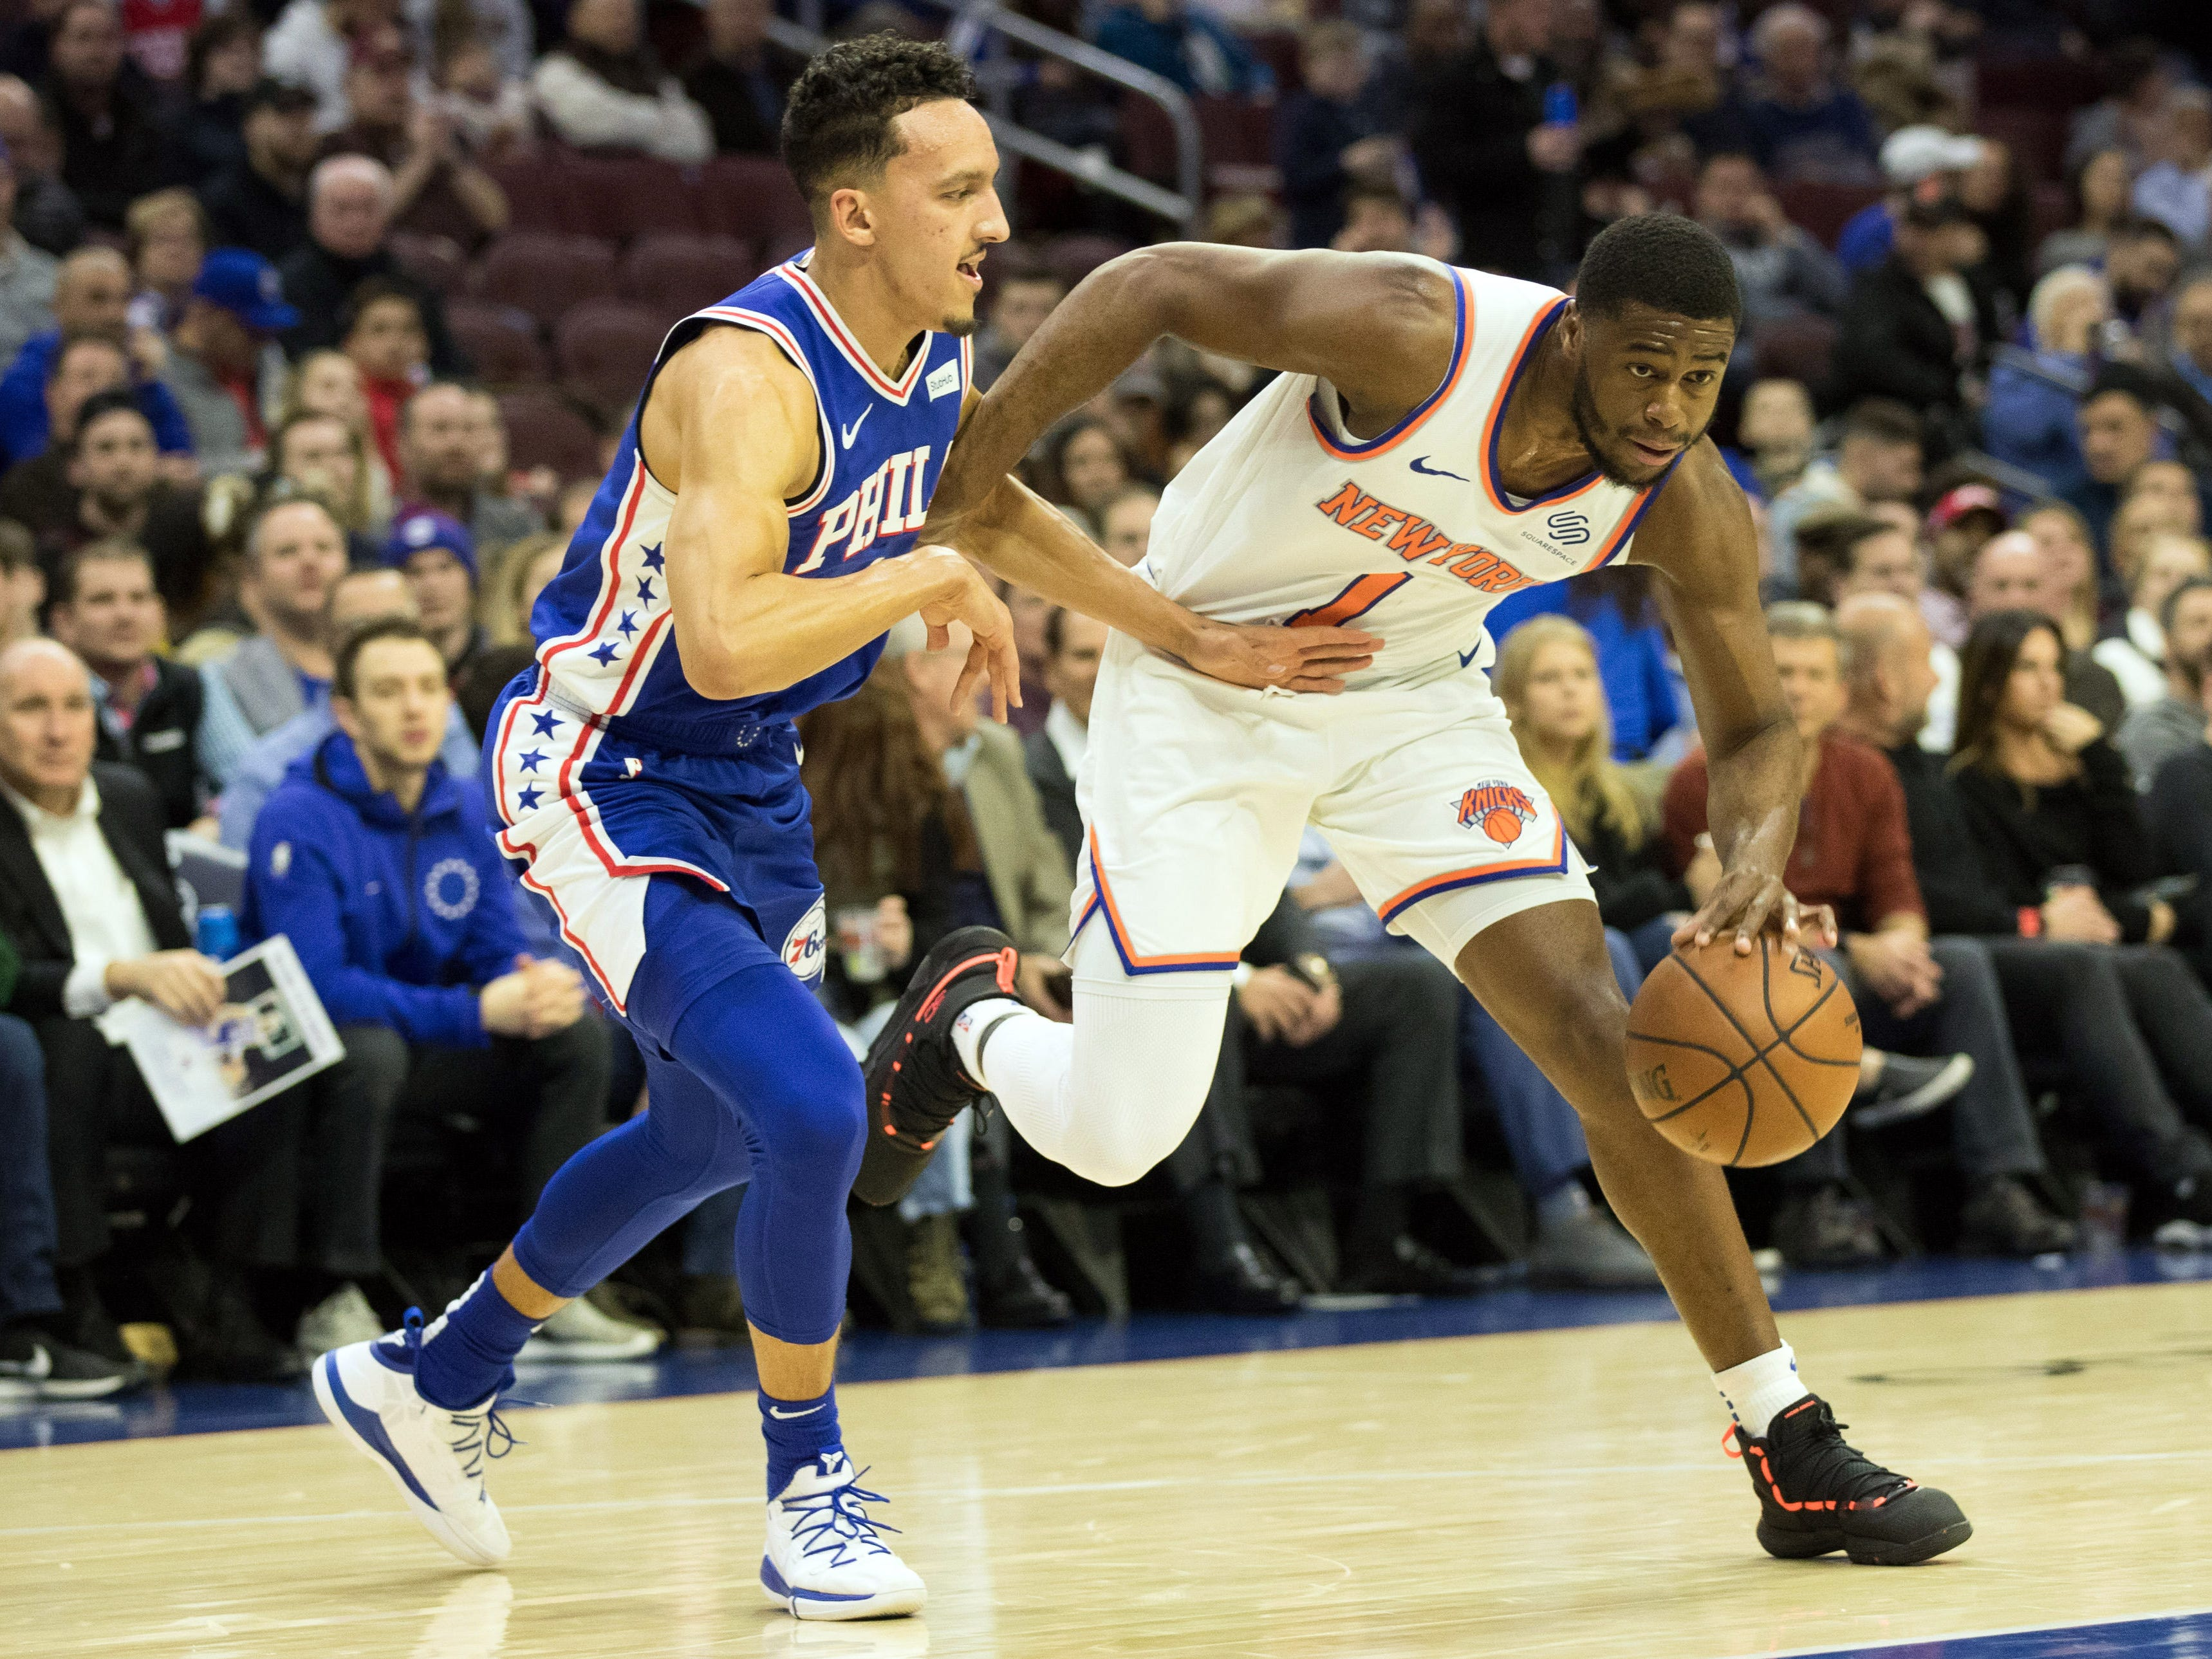 Dec 19, 2018; Philadelphia, PA, USA; New York Knicks guard Emmanuel Mudiay (1) dribbles as Philadelphia 76ers guard Landry Shamet (1) defends during the first quarter at Wells Fargo Center.